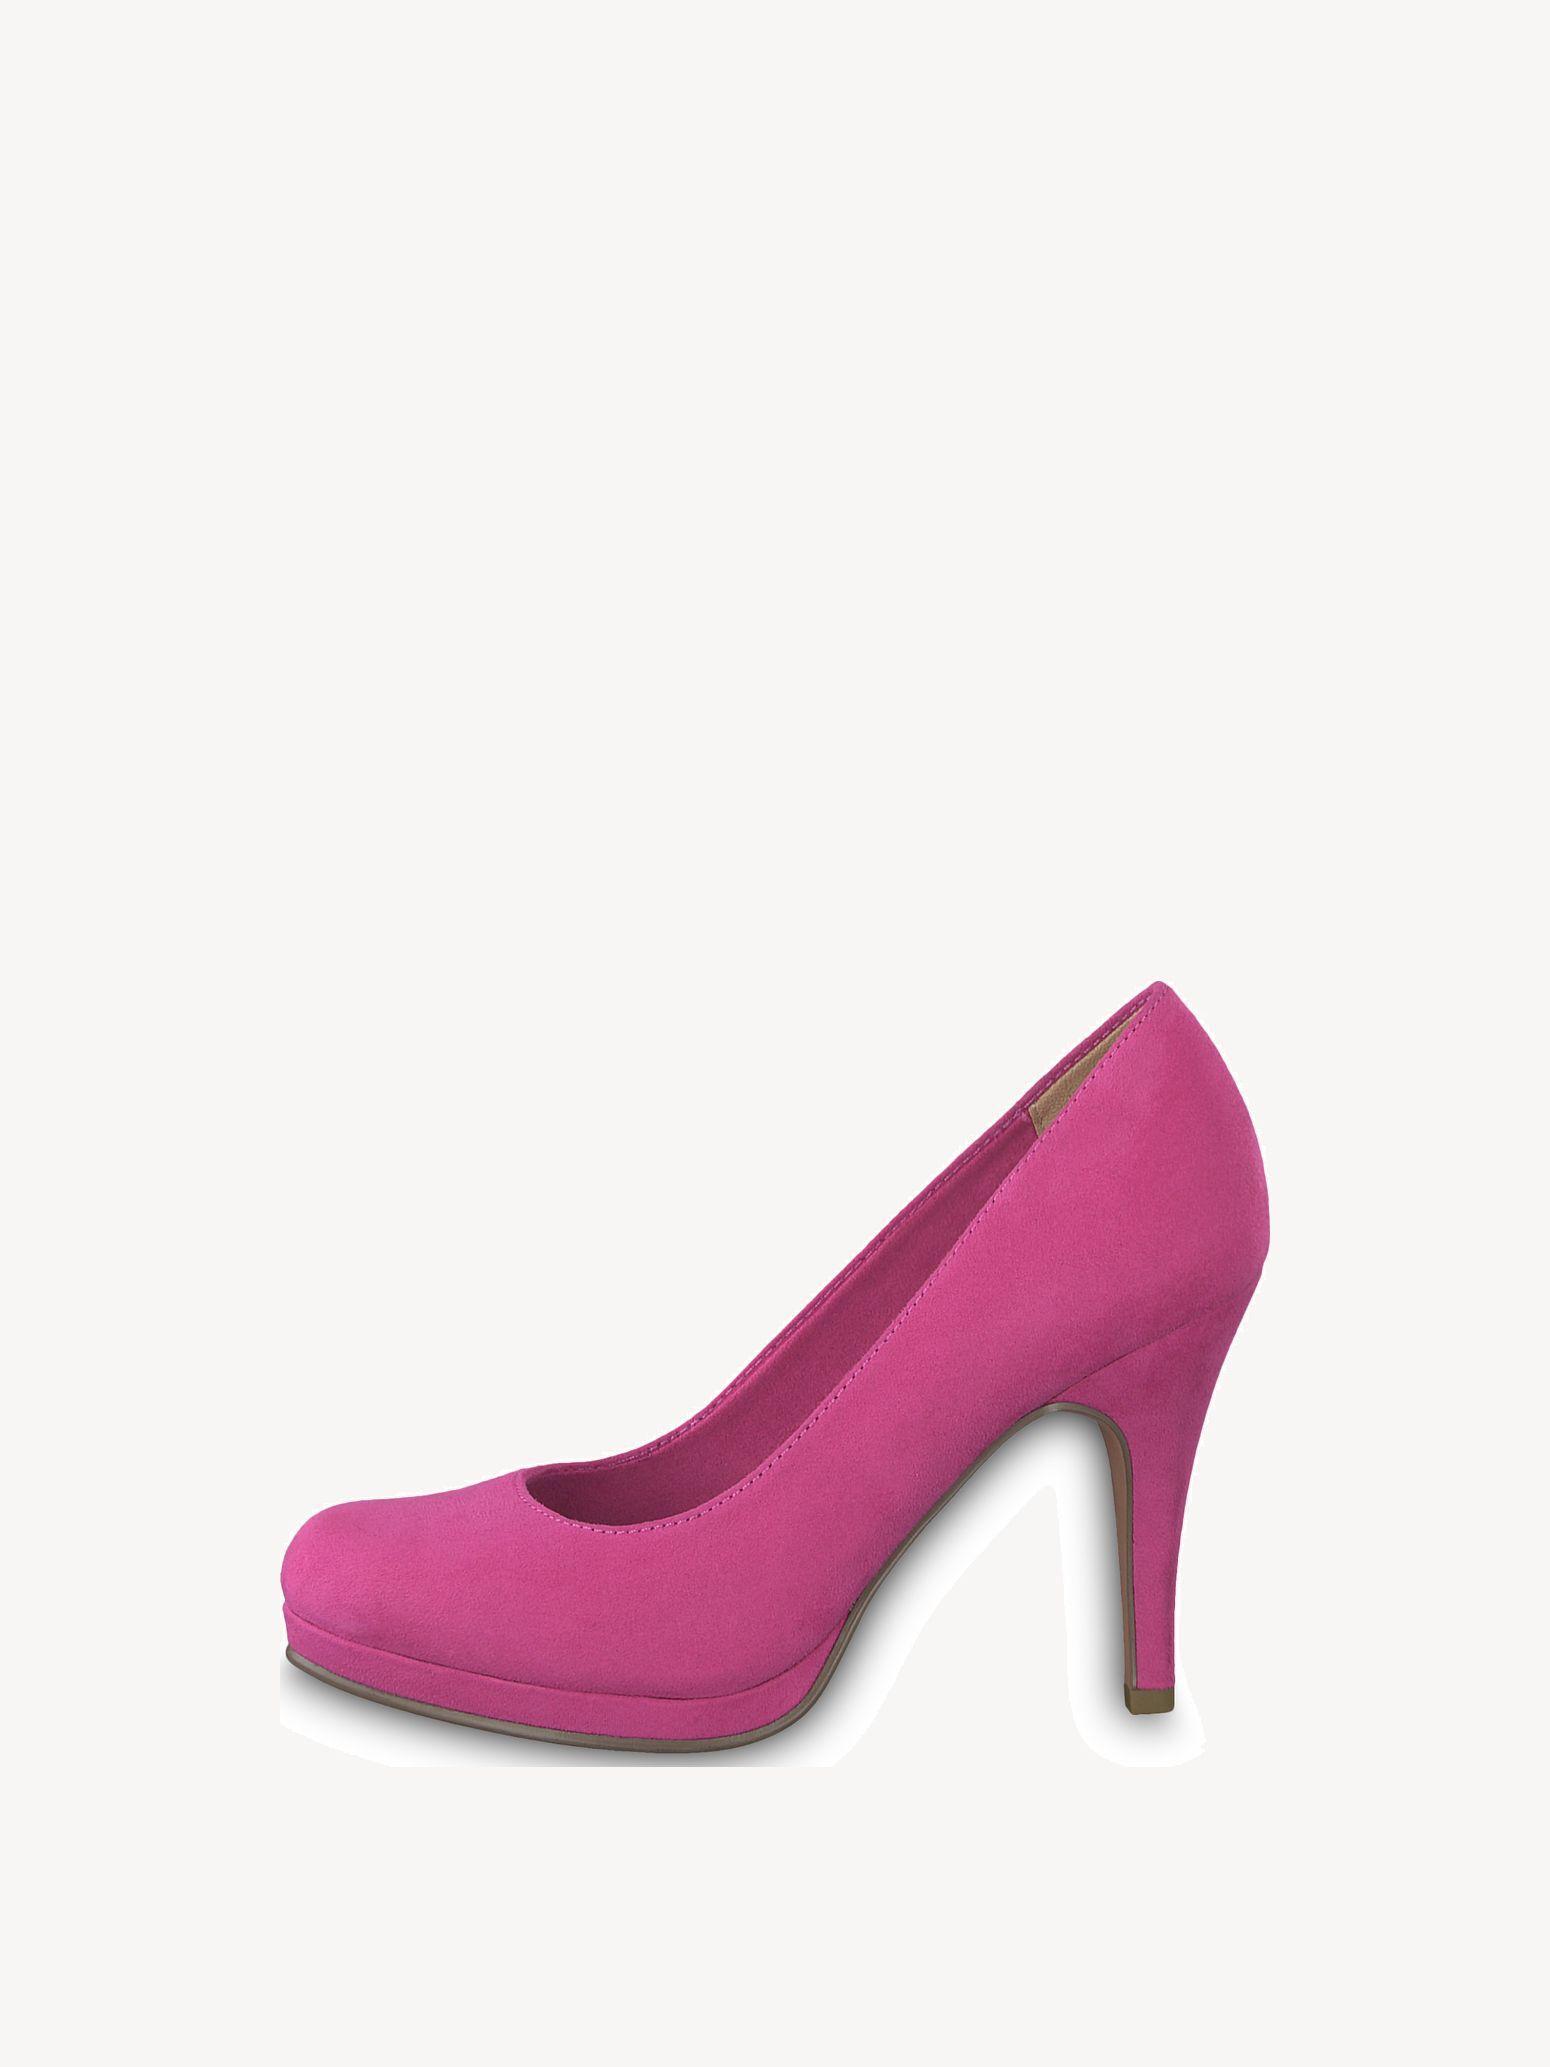 Escarpins Tamaris Femmes Chaussures Escarpins Chaussures Tamaris BS5w6qddR